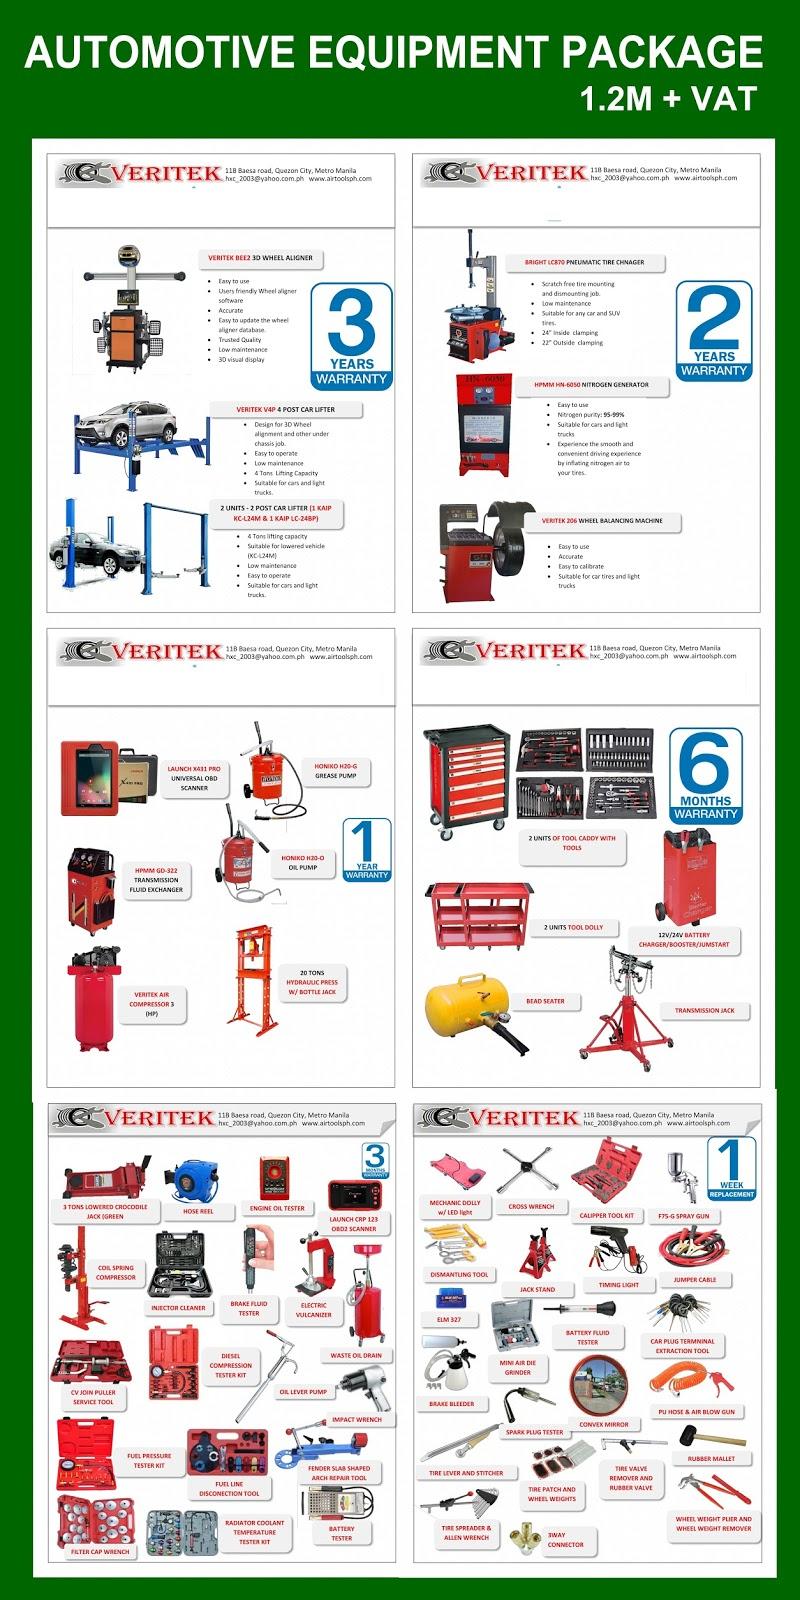 Chucks Auto Body >> Automotive Equipment Package Iloilo Philippines - Philippine Automotive